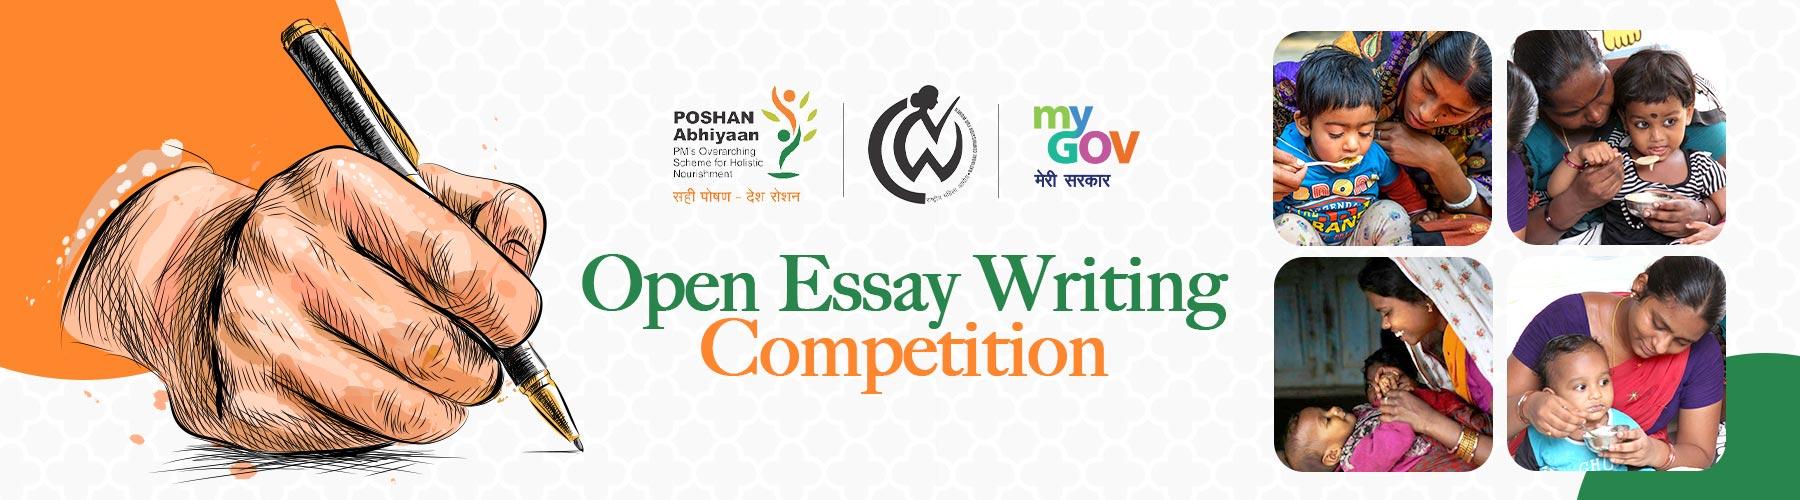 Poshan Maah Open Essay Writing Competition